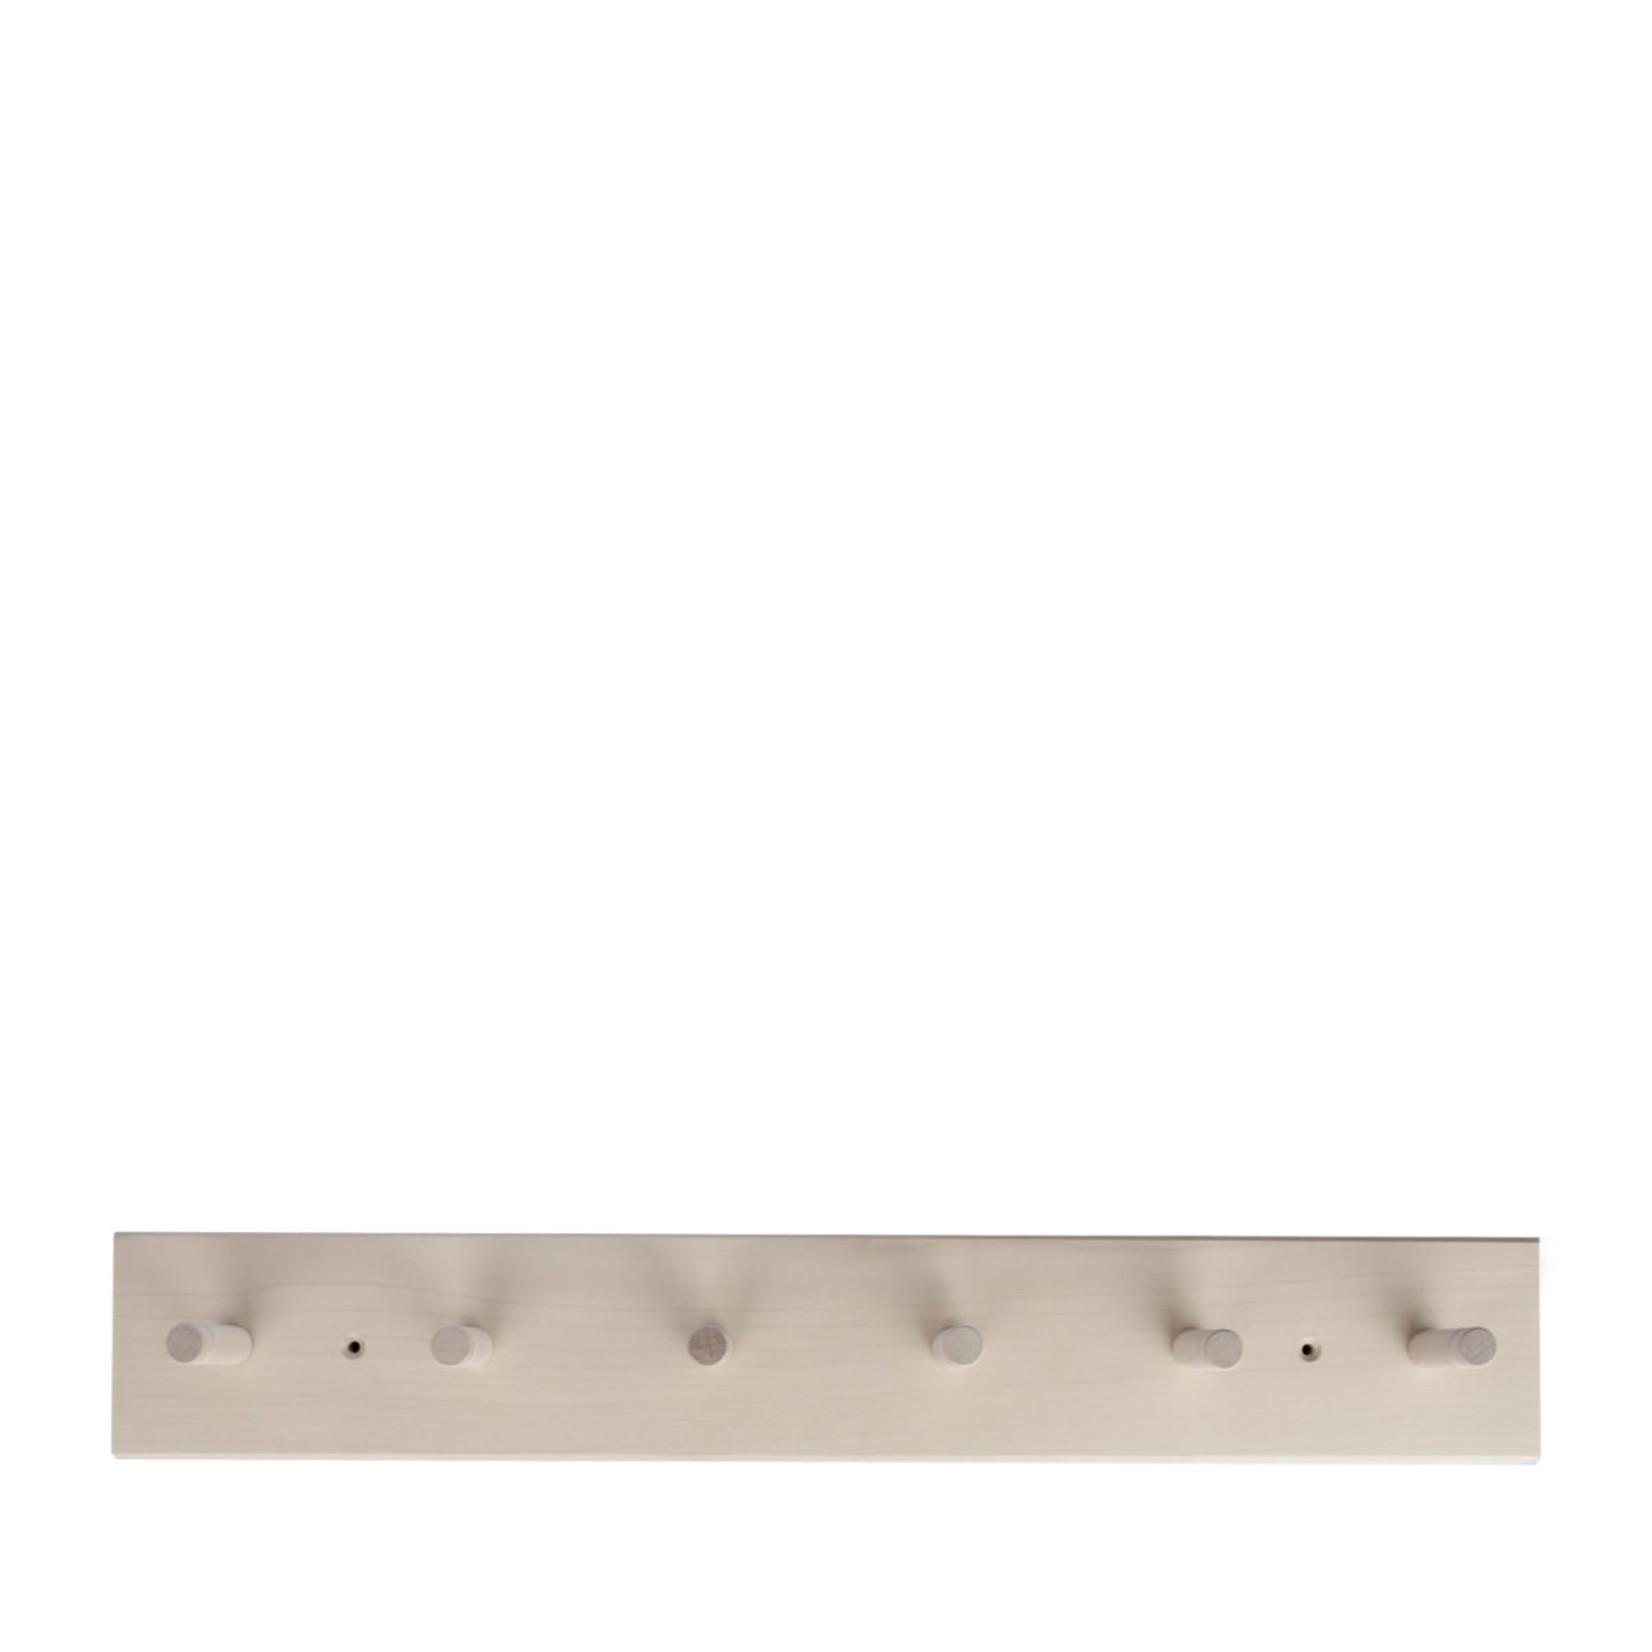 Storefactory  Gaderobe /Hakenleiste Hallsta